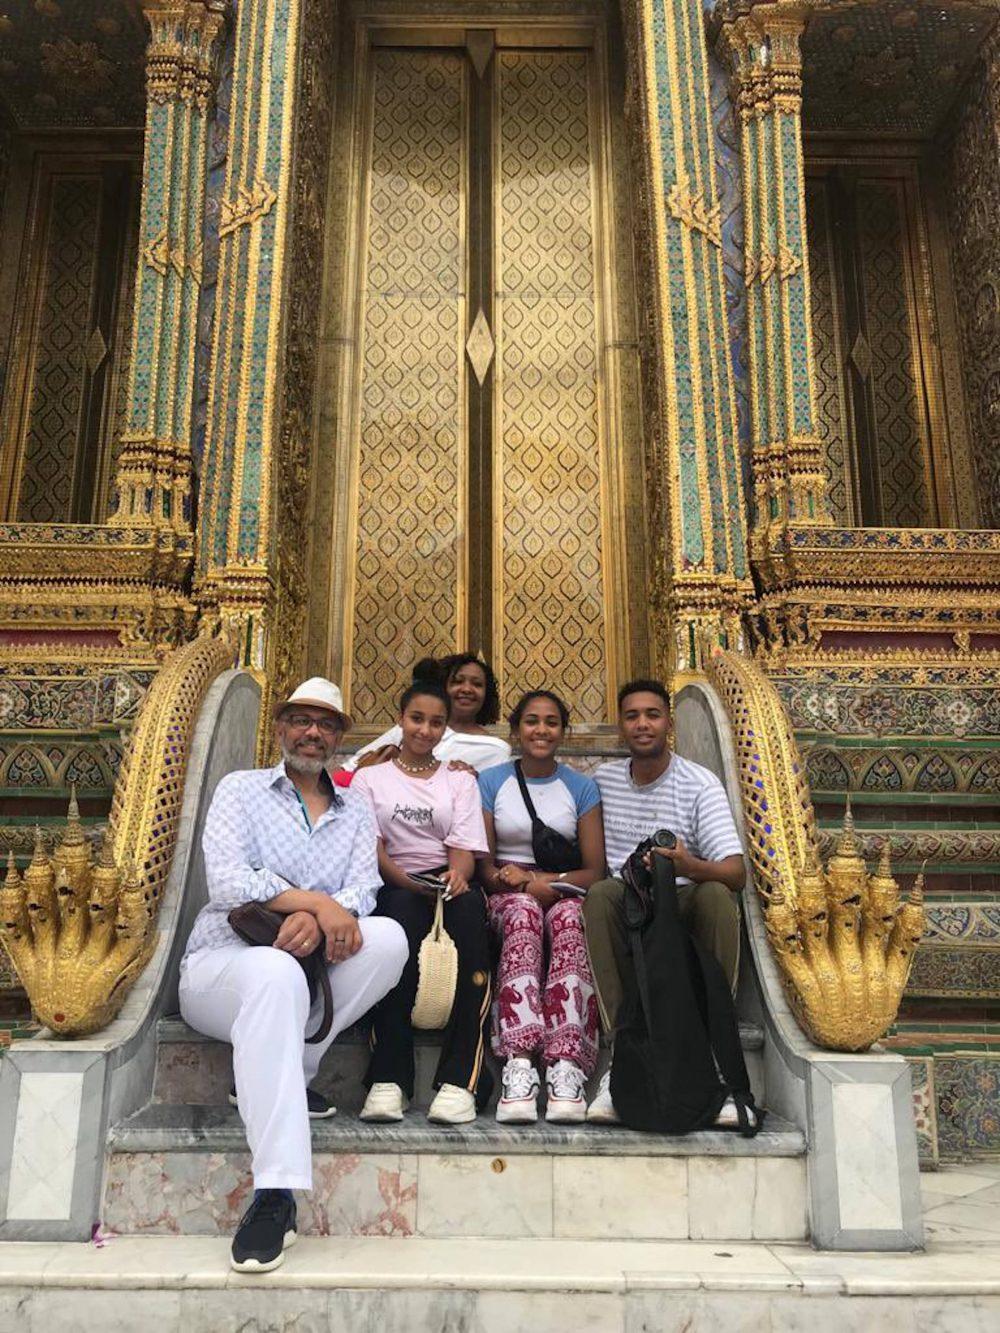 The Shehata family | Community News UK